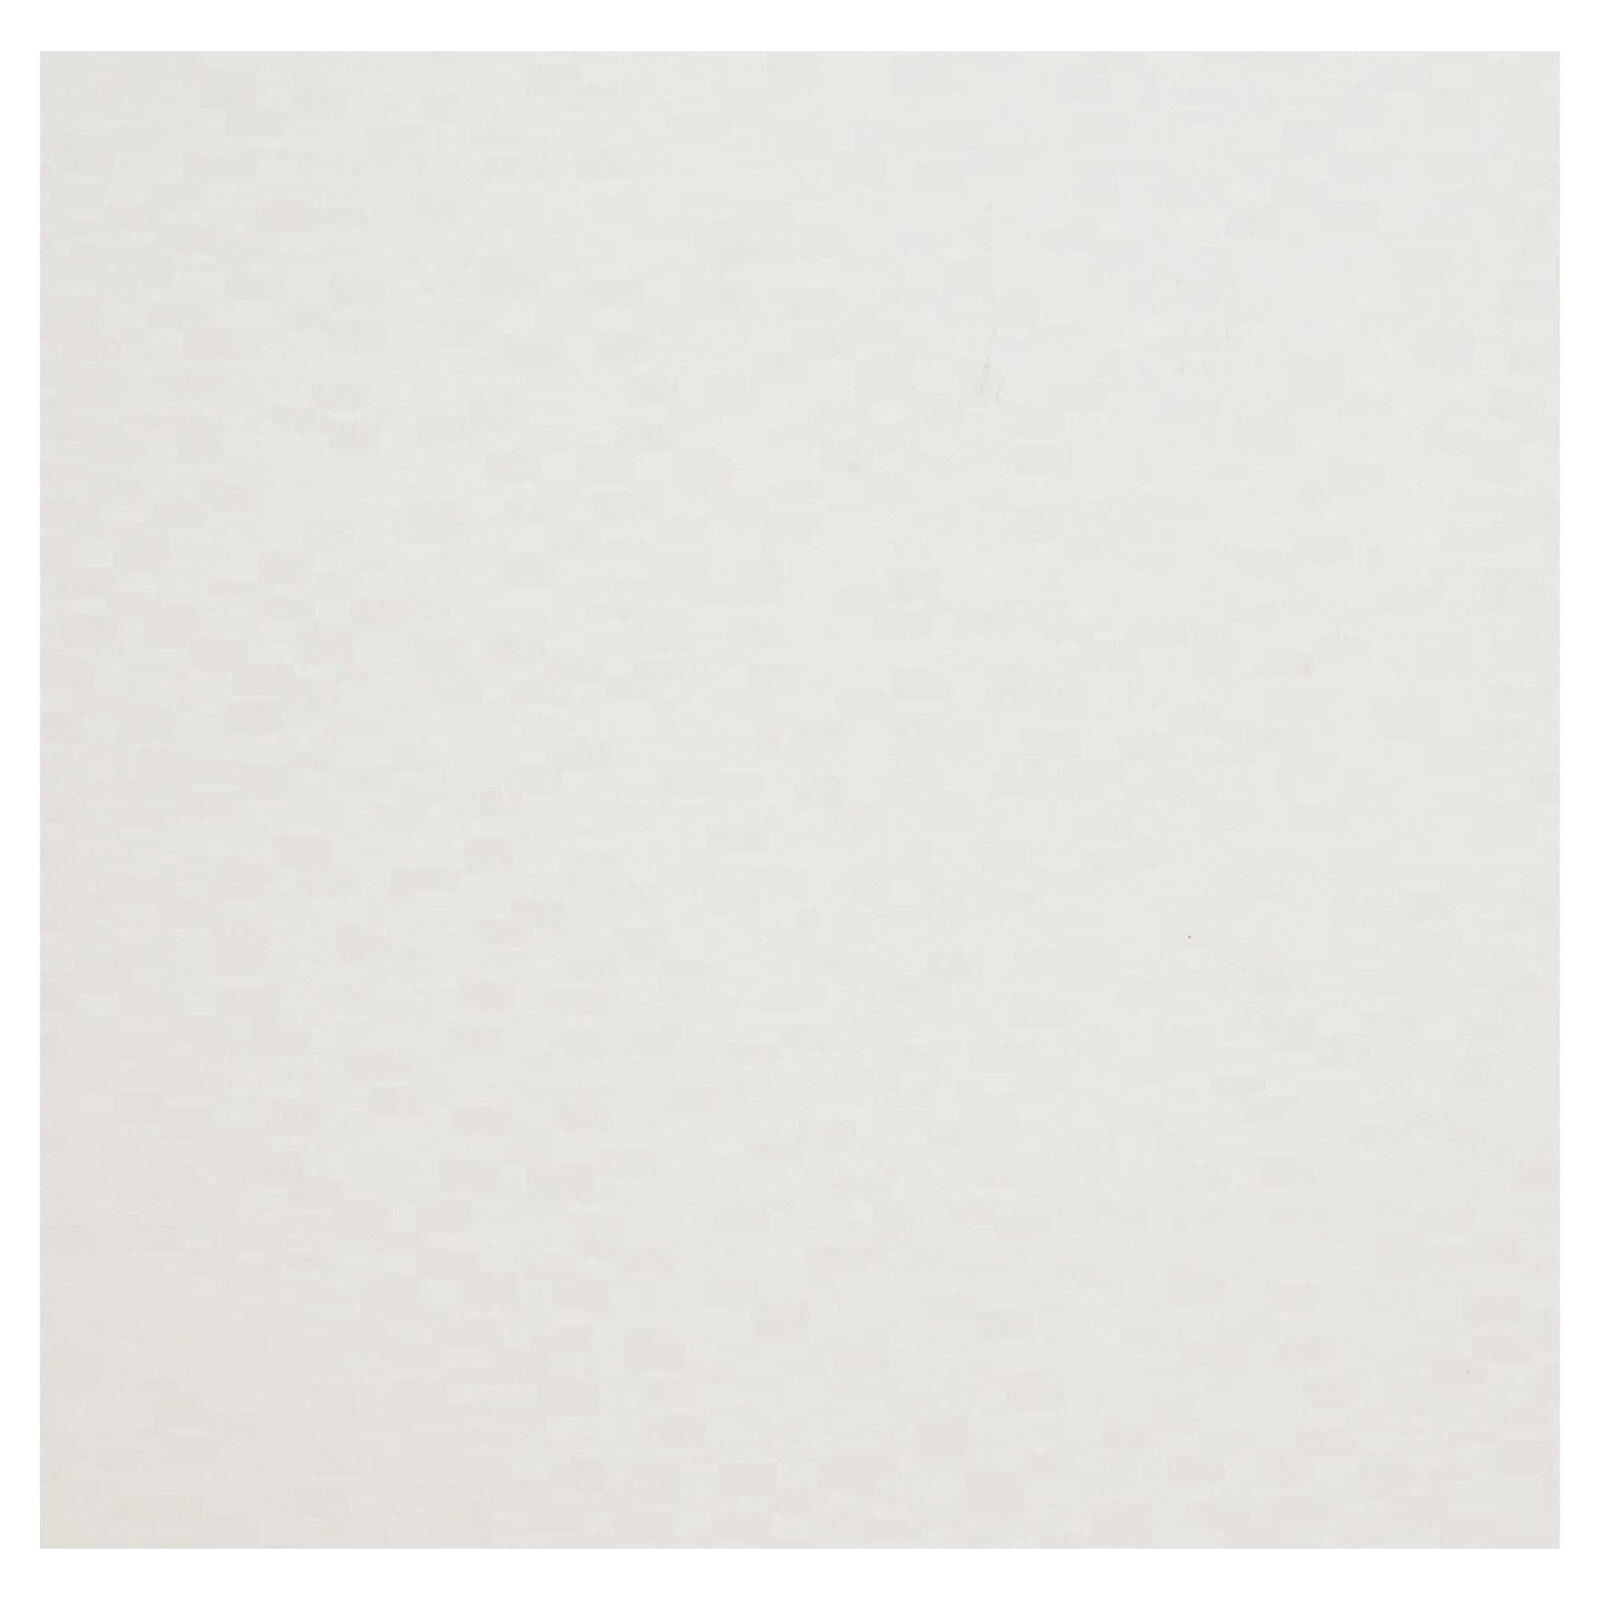 Мебельный щит 6х600х3000 (№38) БЕЛЫЙ ПЕРЛАМУТР